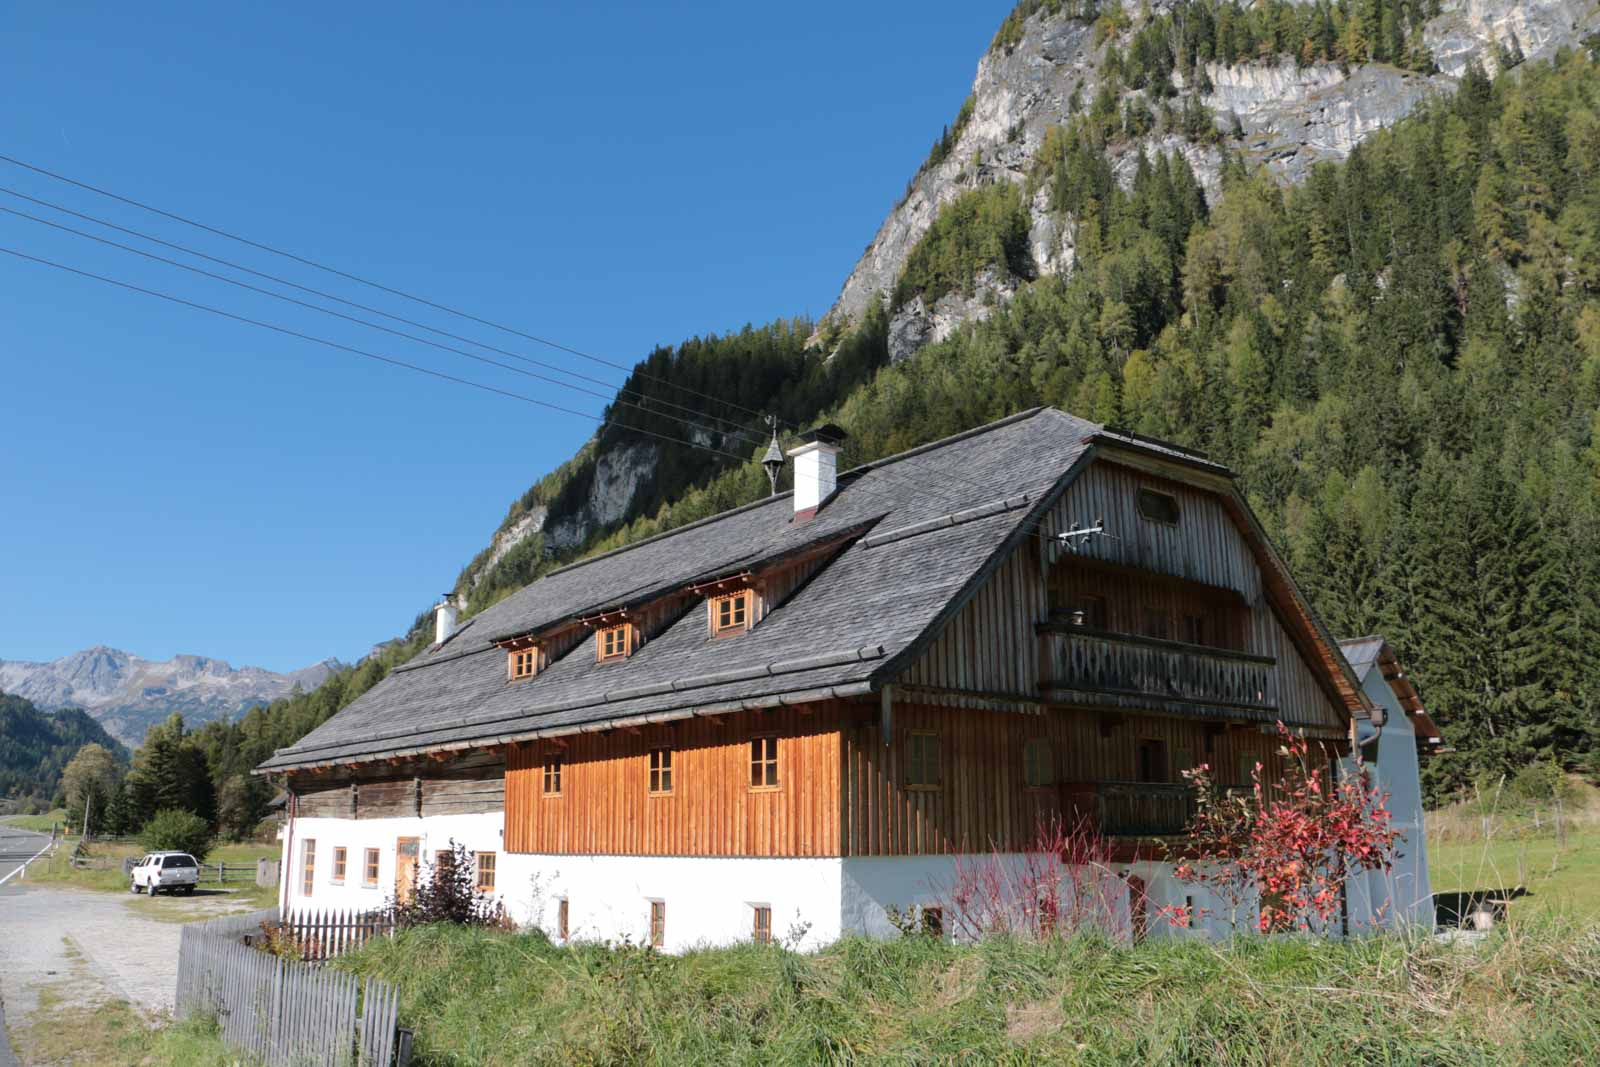 Stoffengut tweng holzbau mauterndorf for Architekt planung